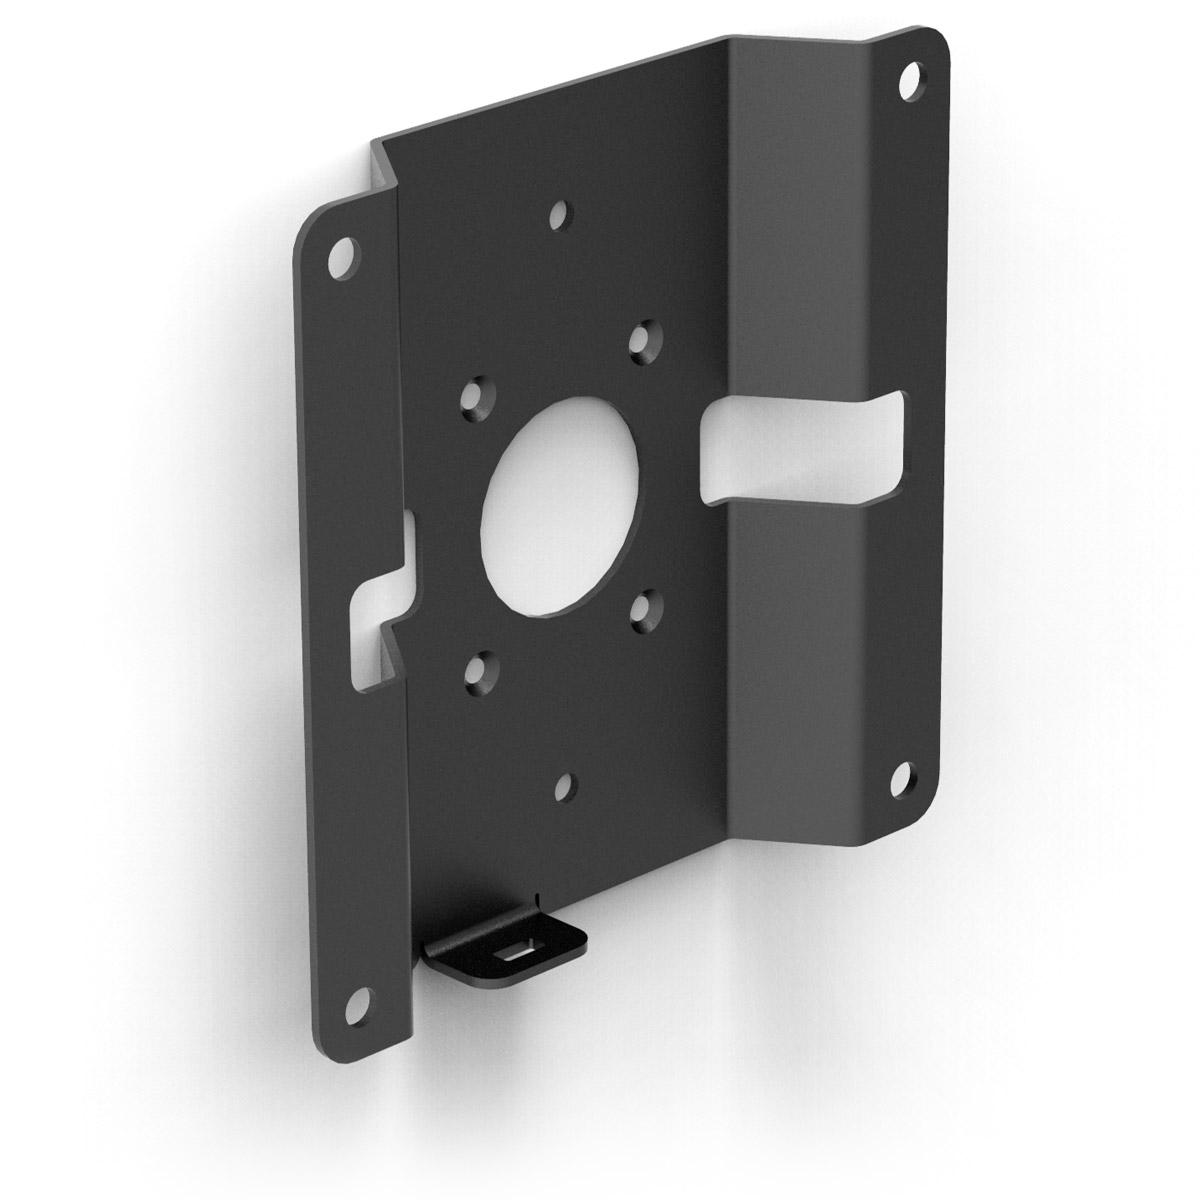 T-bar lock slot